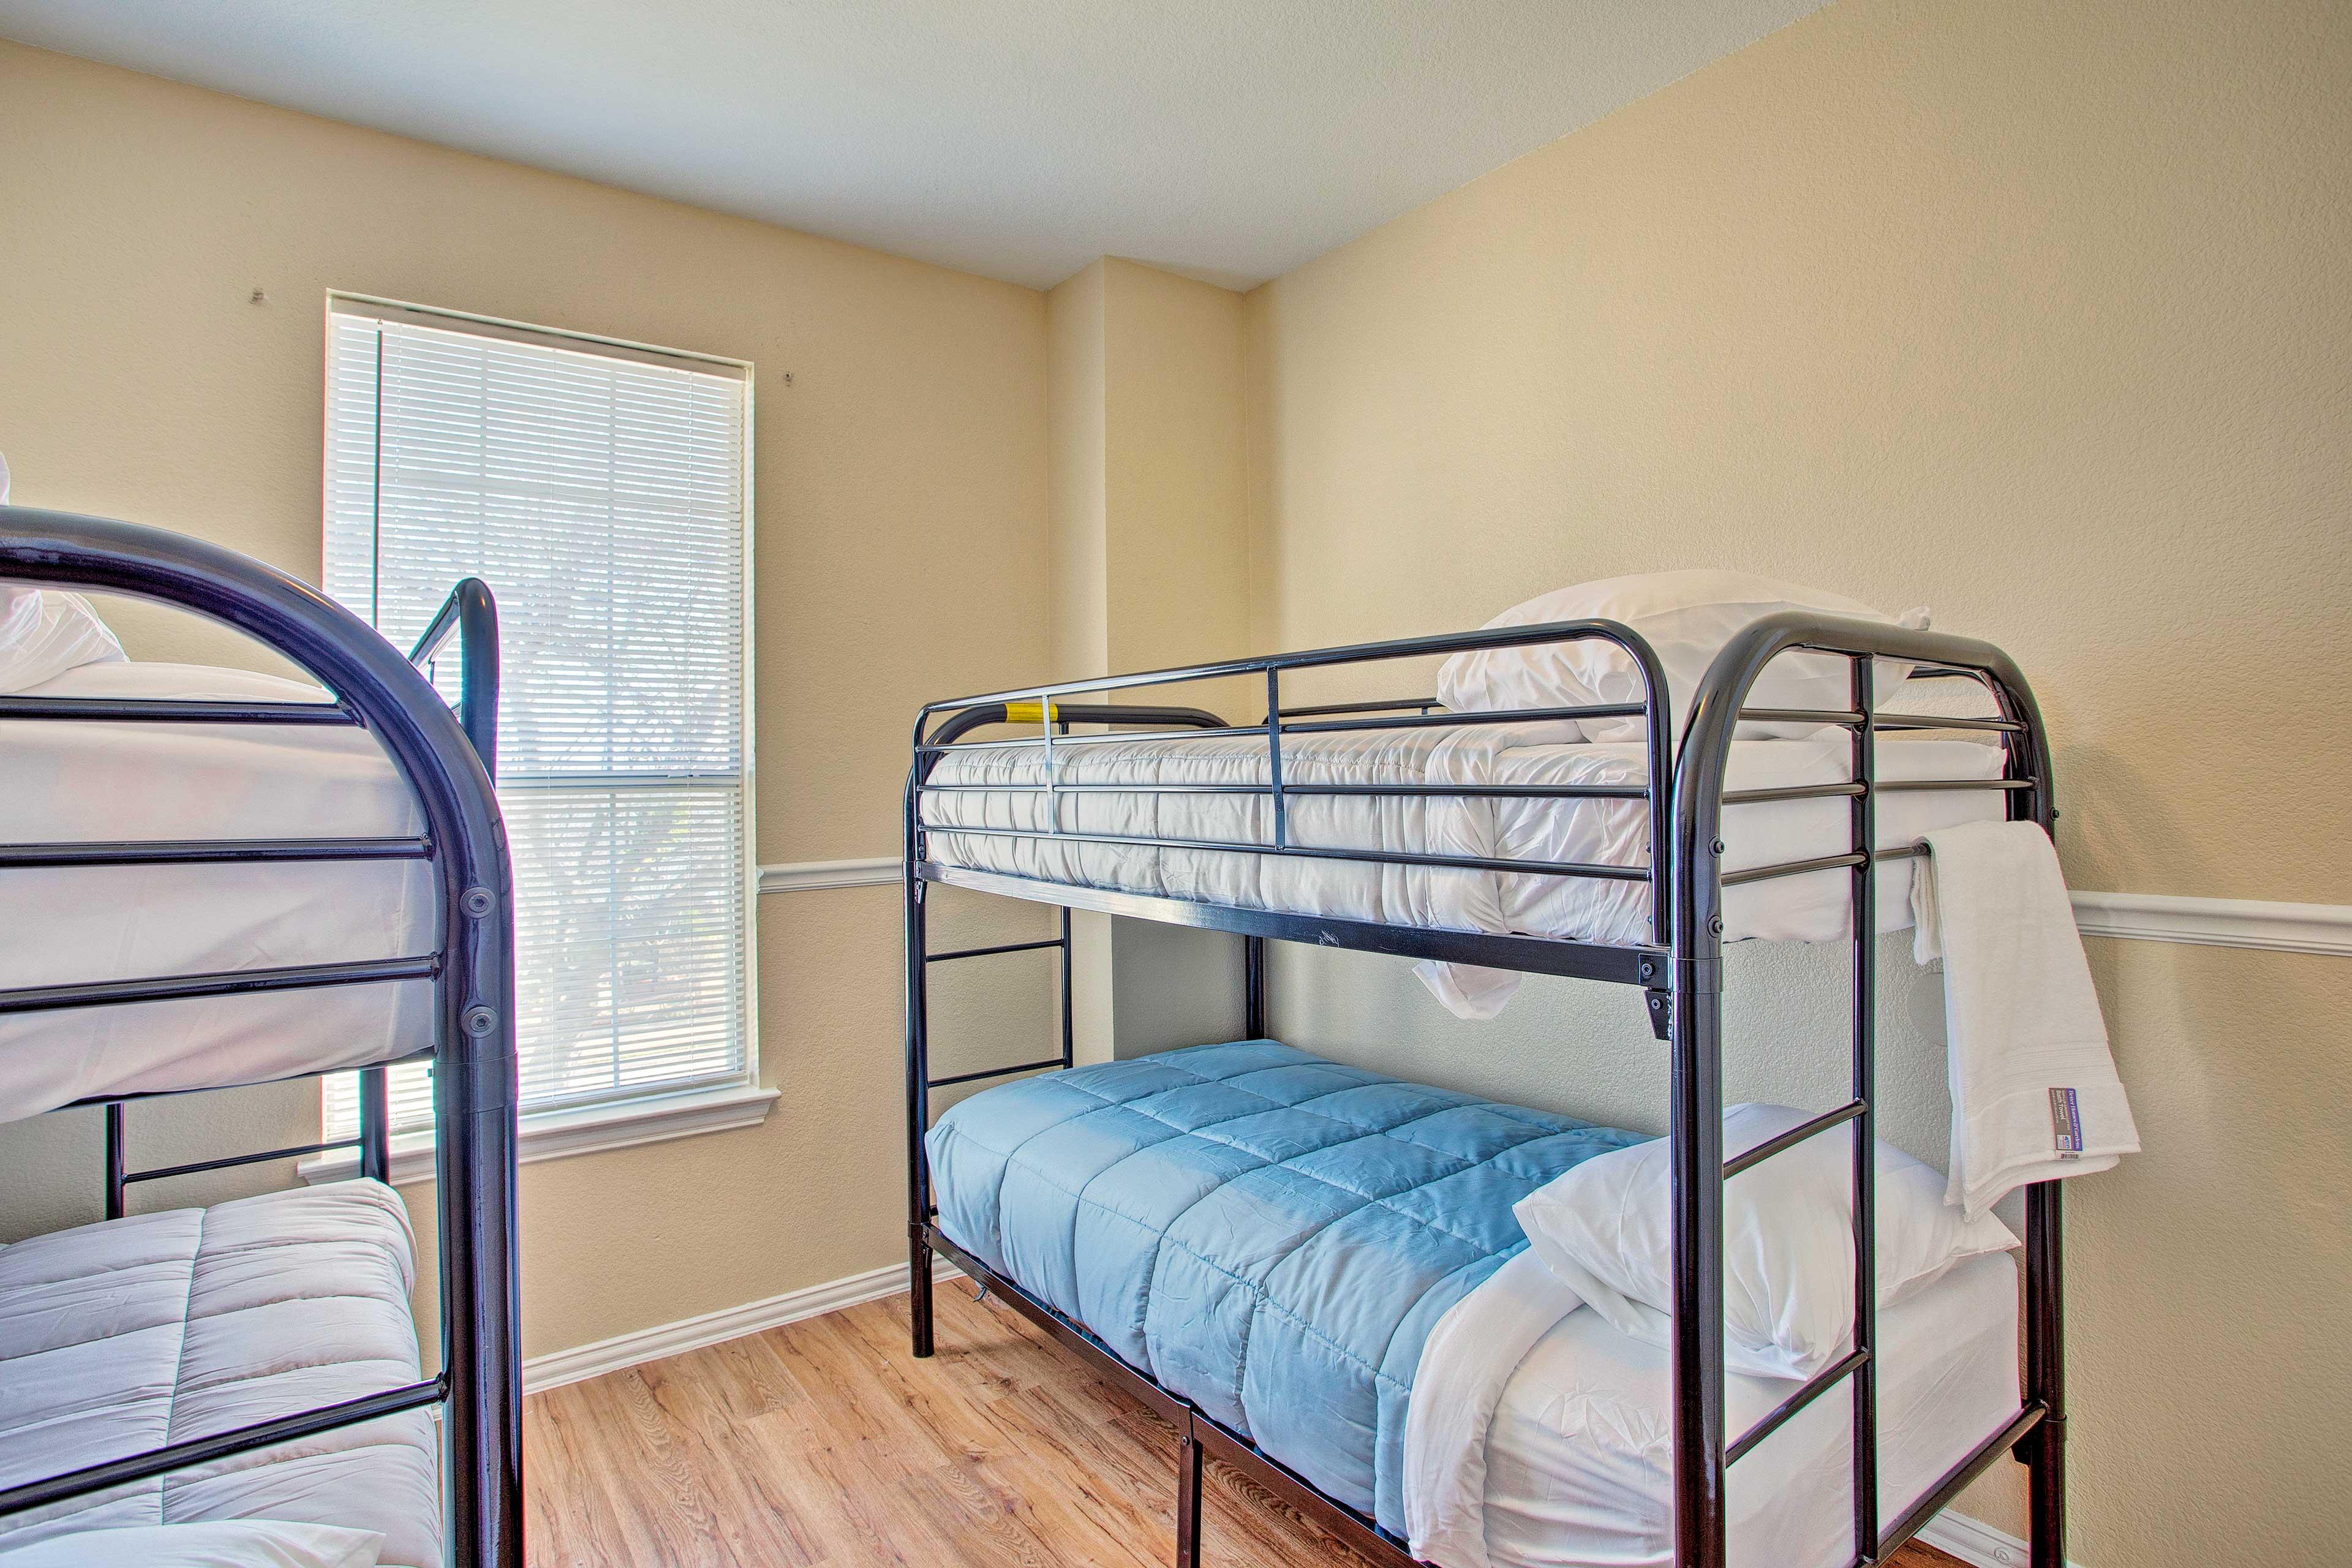 The kids will love having a sleepover in bedroom 4!